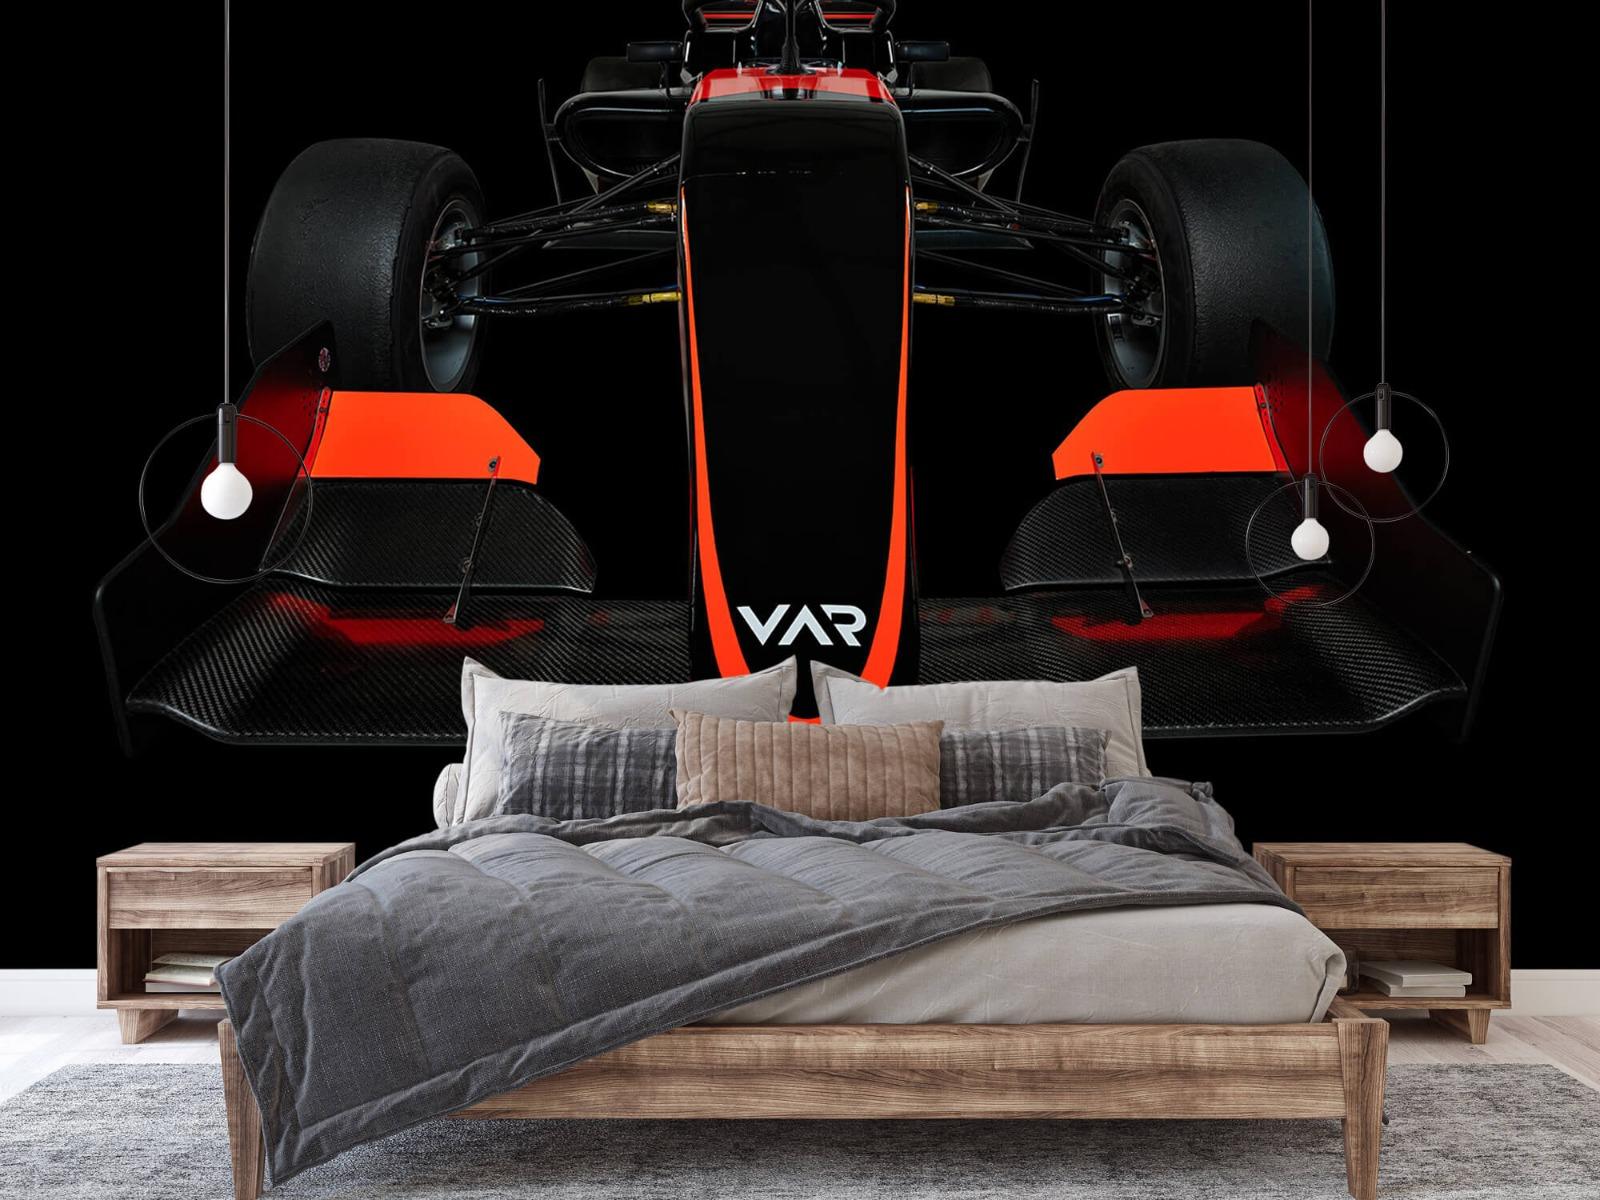 Sportauto's - Formule 3 - Lower front view - dark - Slaapkamer 2